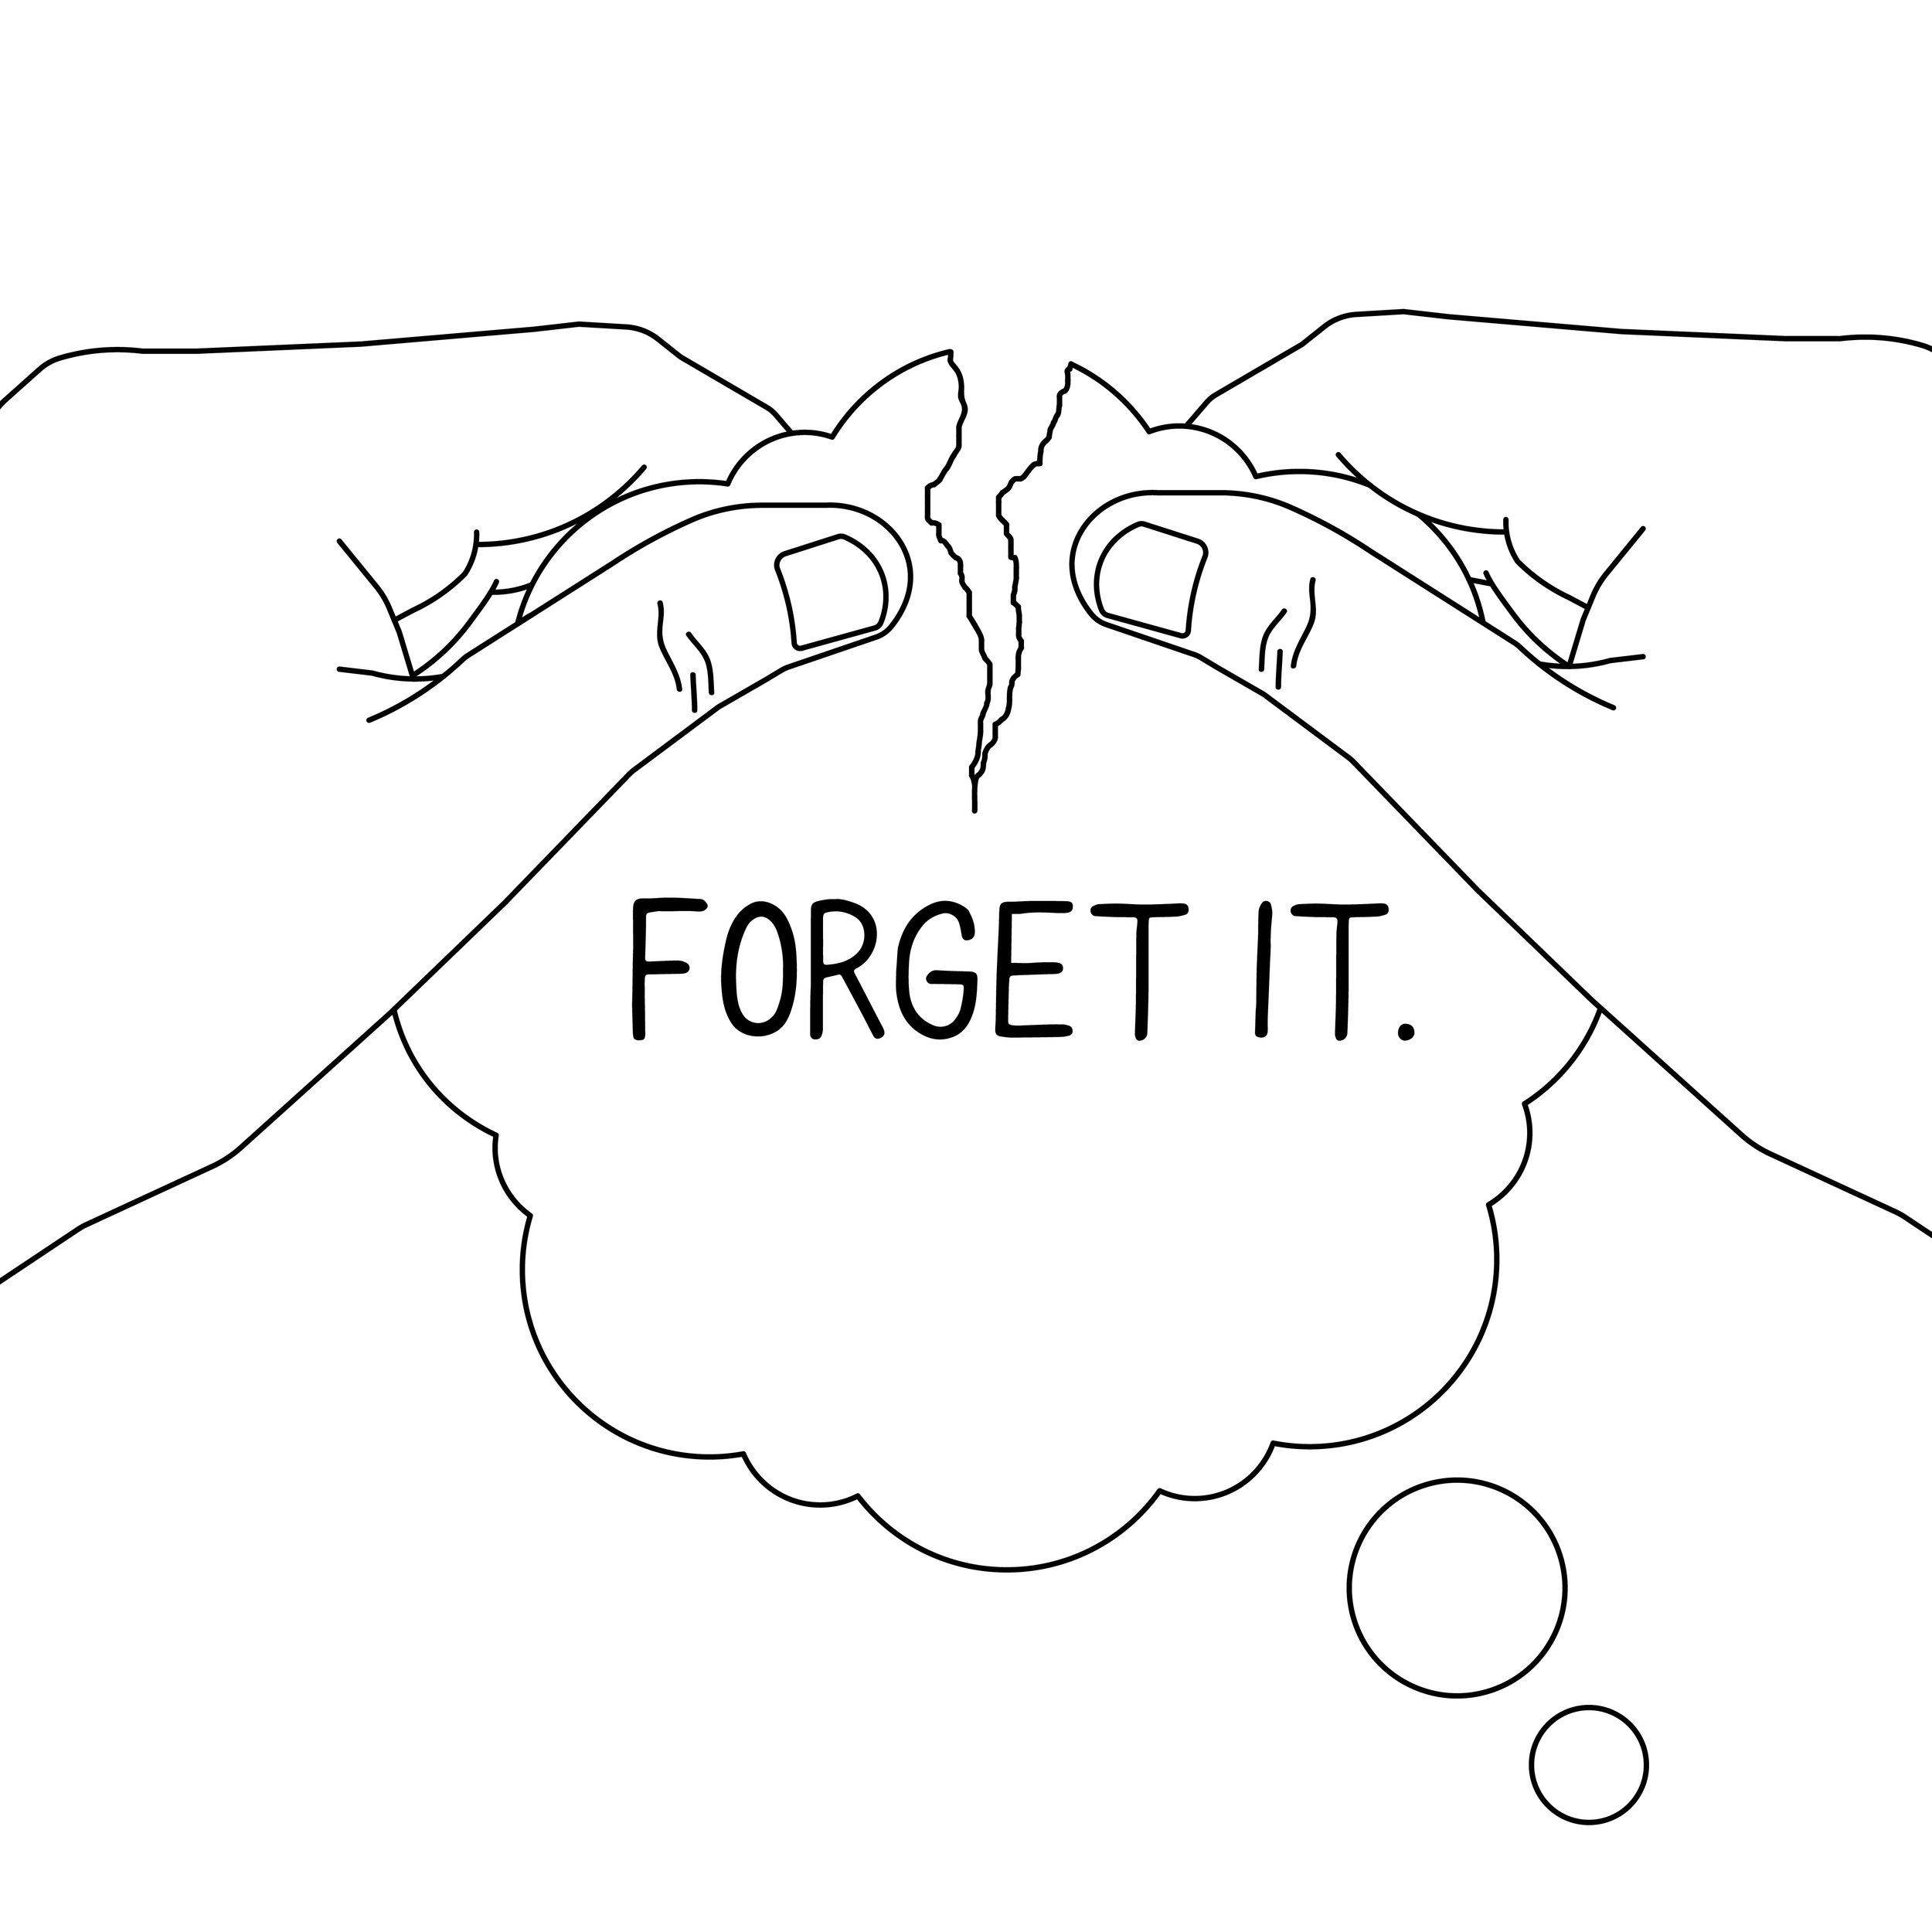 forgetit-01.jpg